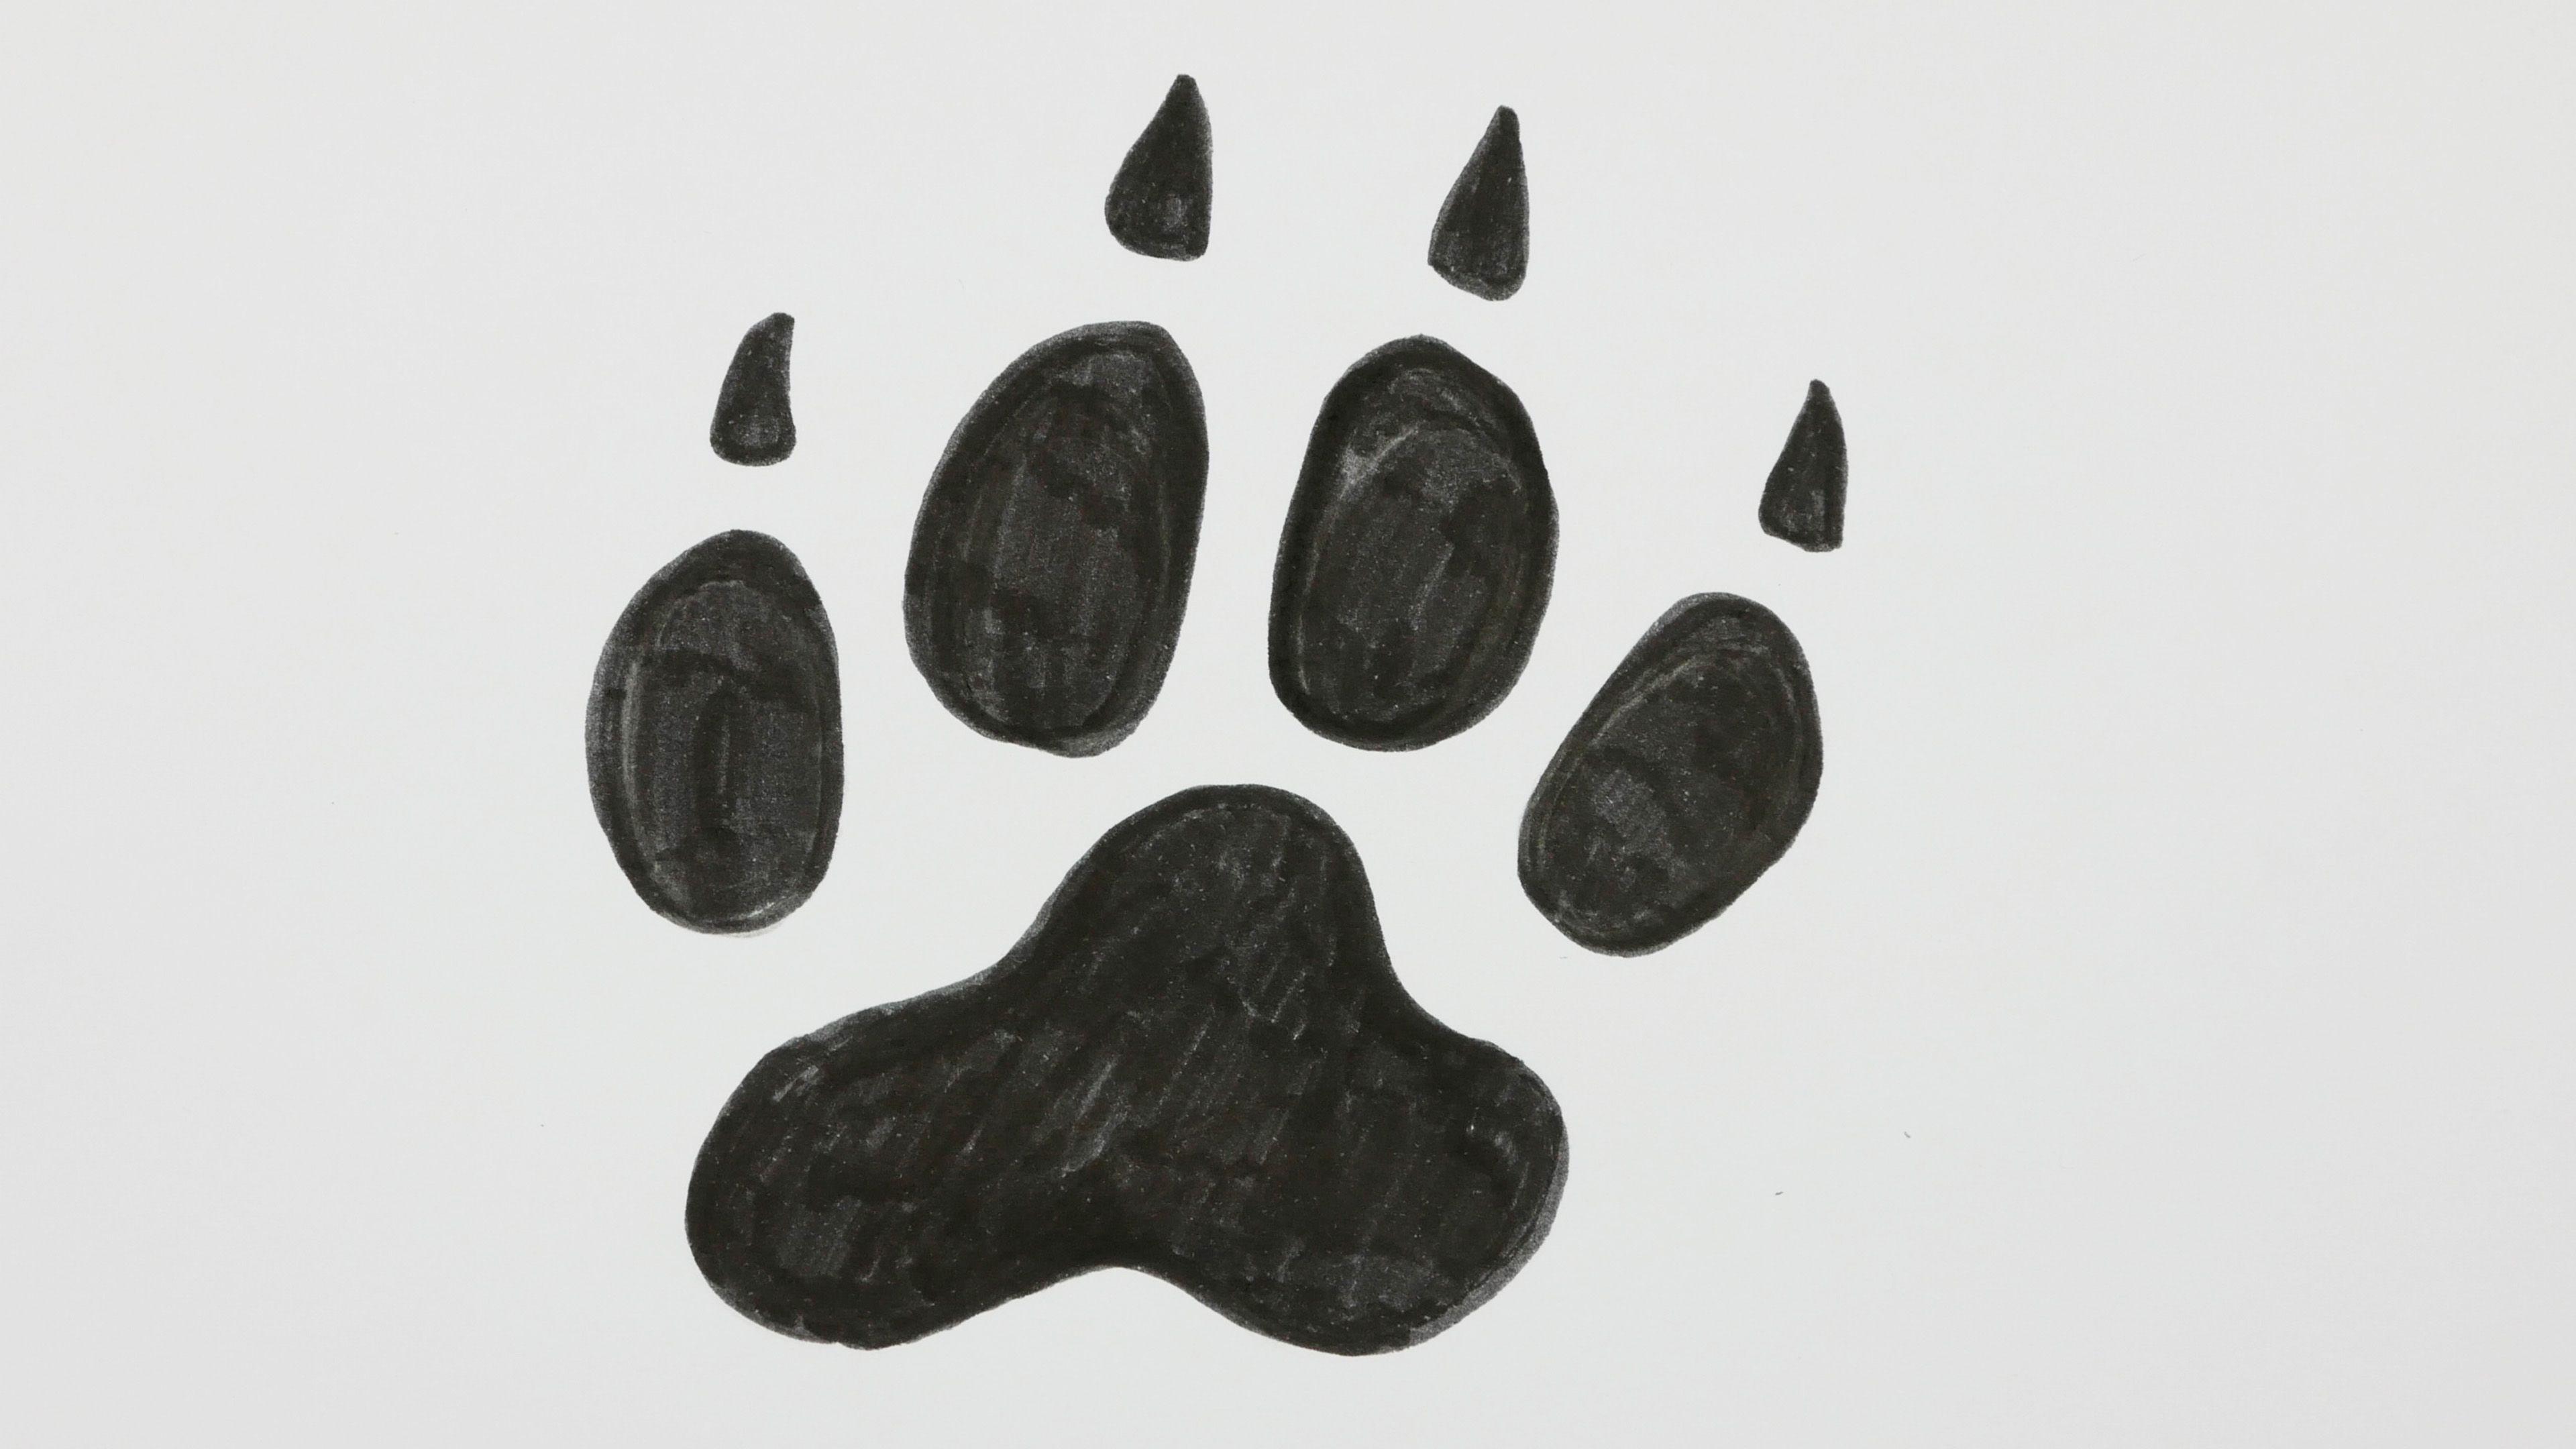 How To Draw A Dog Footprint Dog Paw Doodle Cartoon Comic Pic 14 Youtube Https Youtu Be 7 Tny Ulzek Subscrib Doodle Cartoon Drawings Dog Paw Cartoon